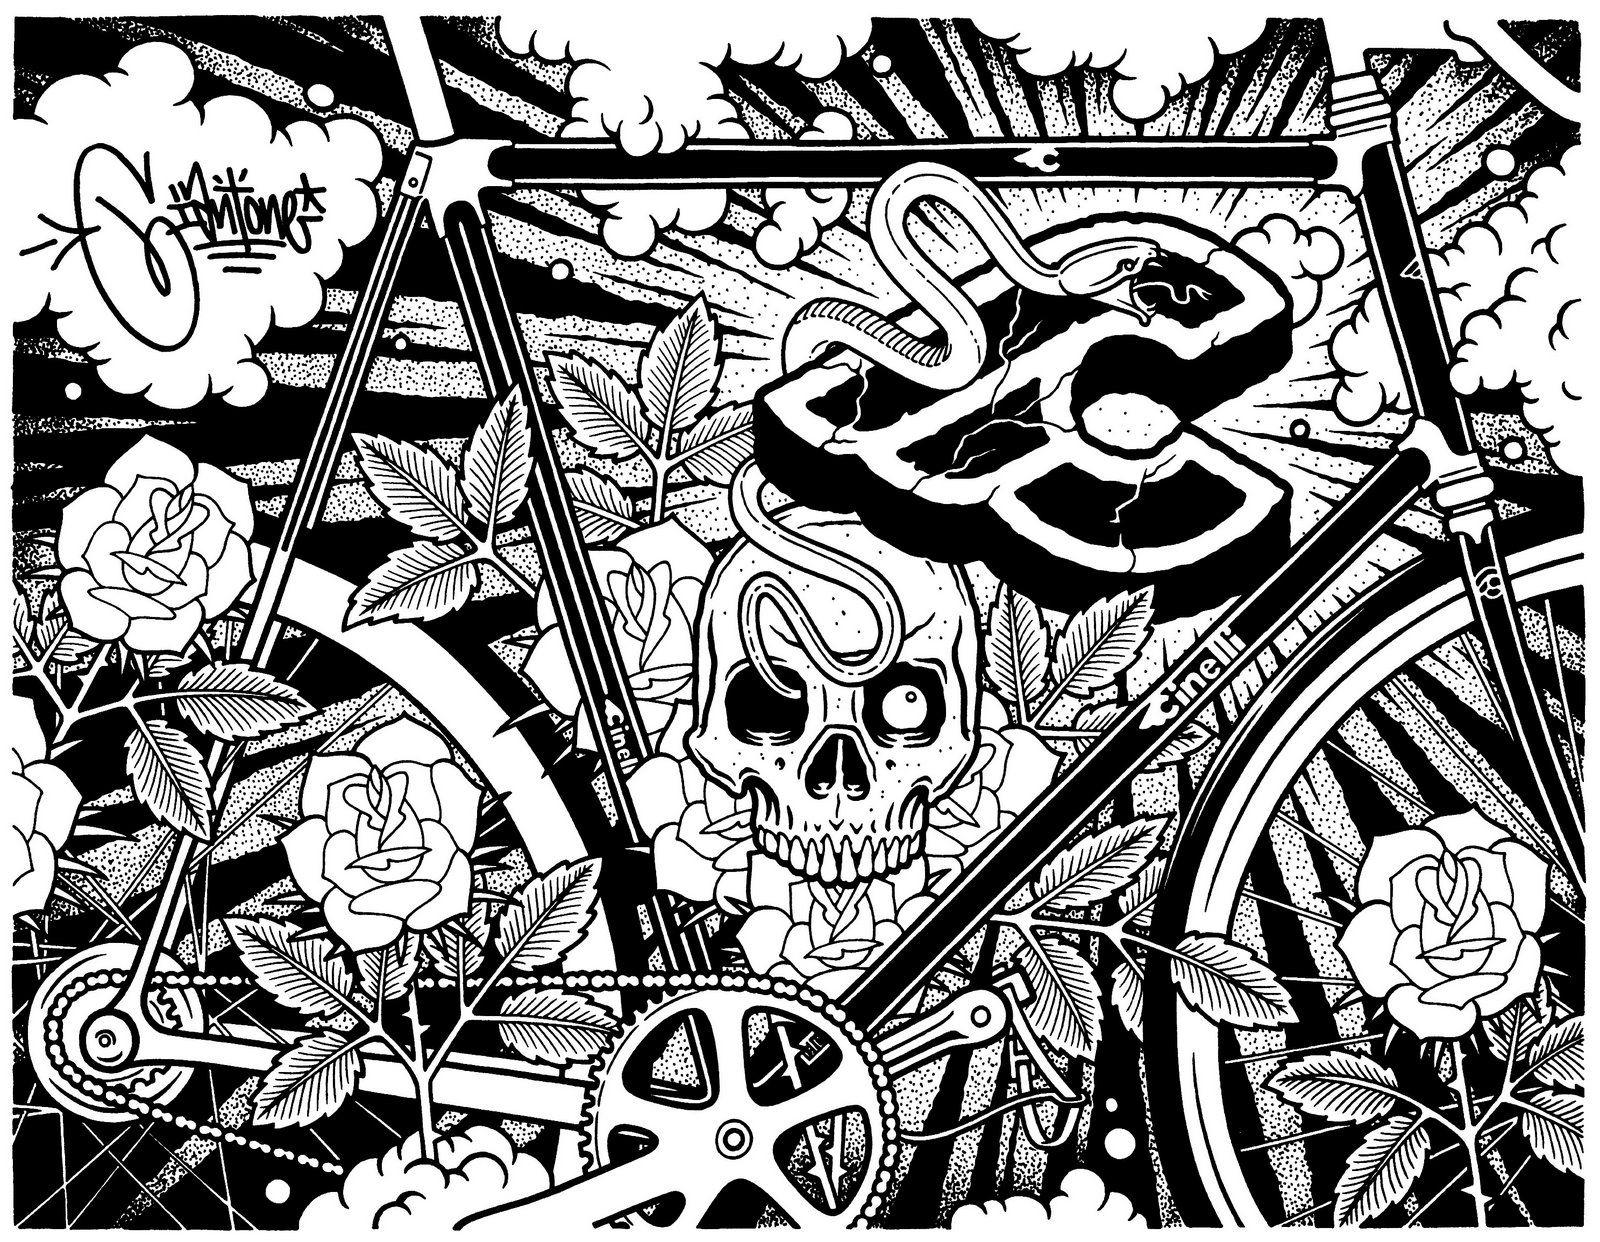 giant art graffiti | BIGGER version here.